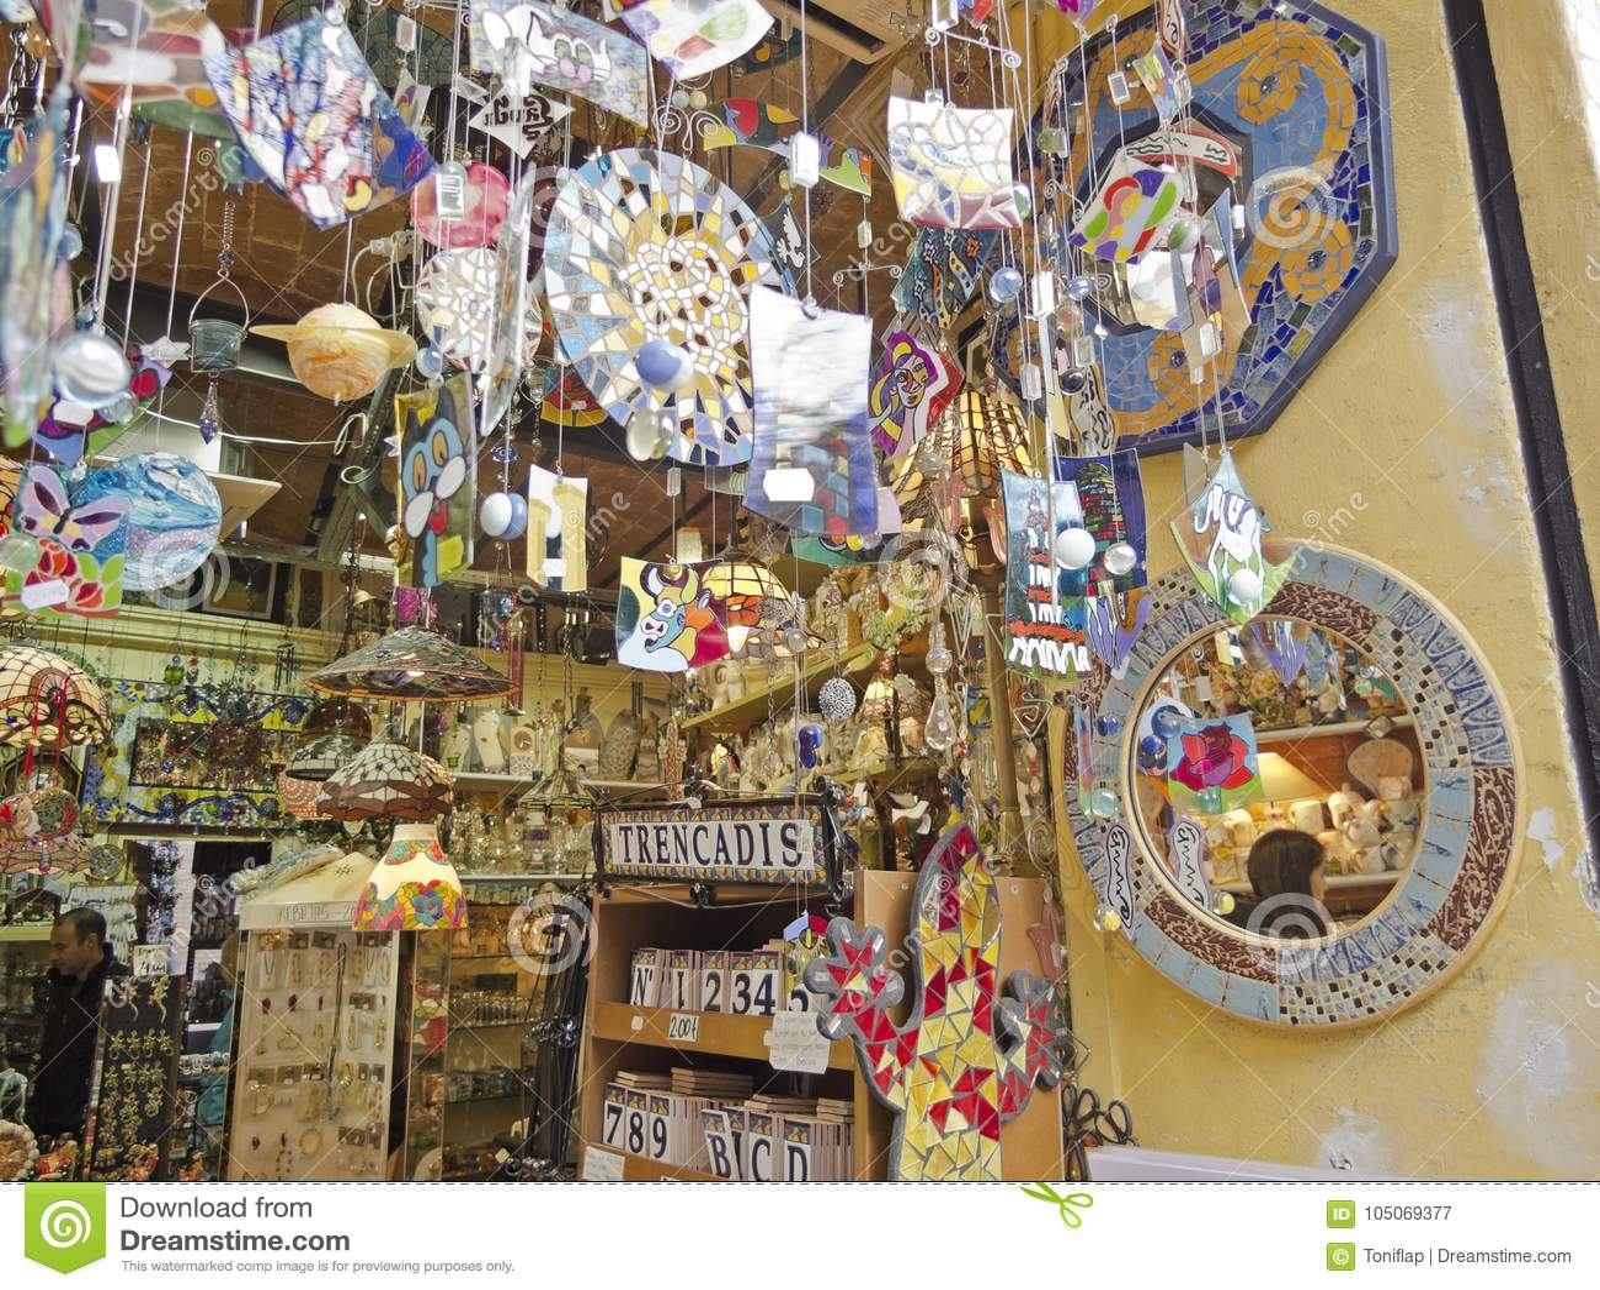 6045a255fe6db A souvenir shop in barcelona catalonia spain editorial jpg 1300x1065 Gaudi  shop